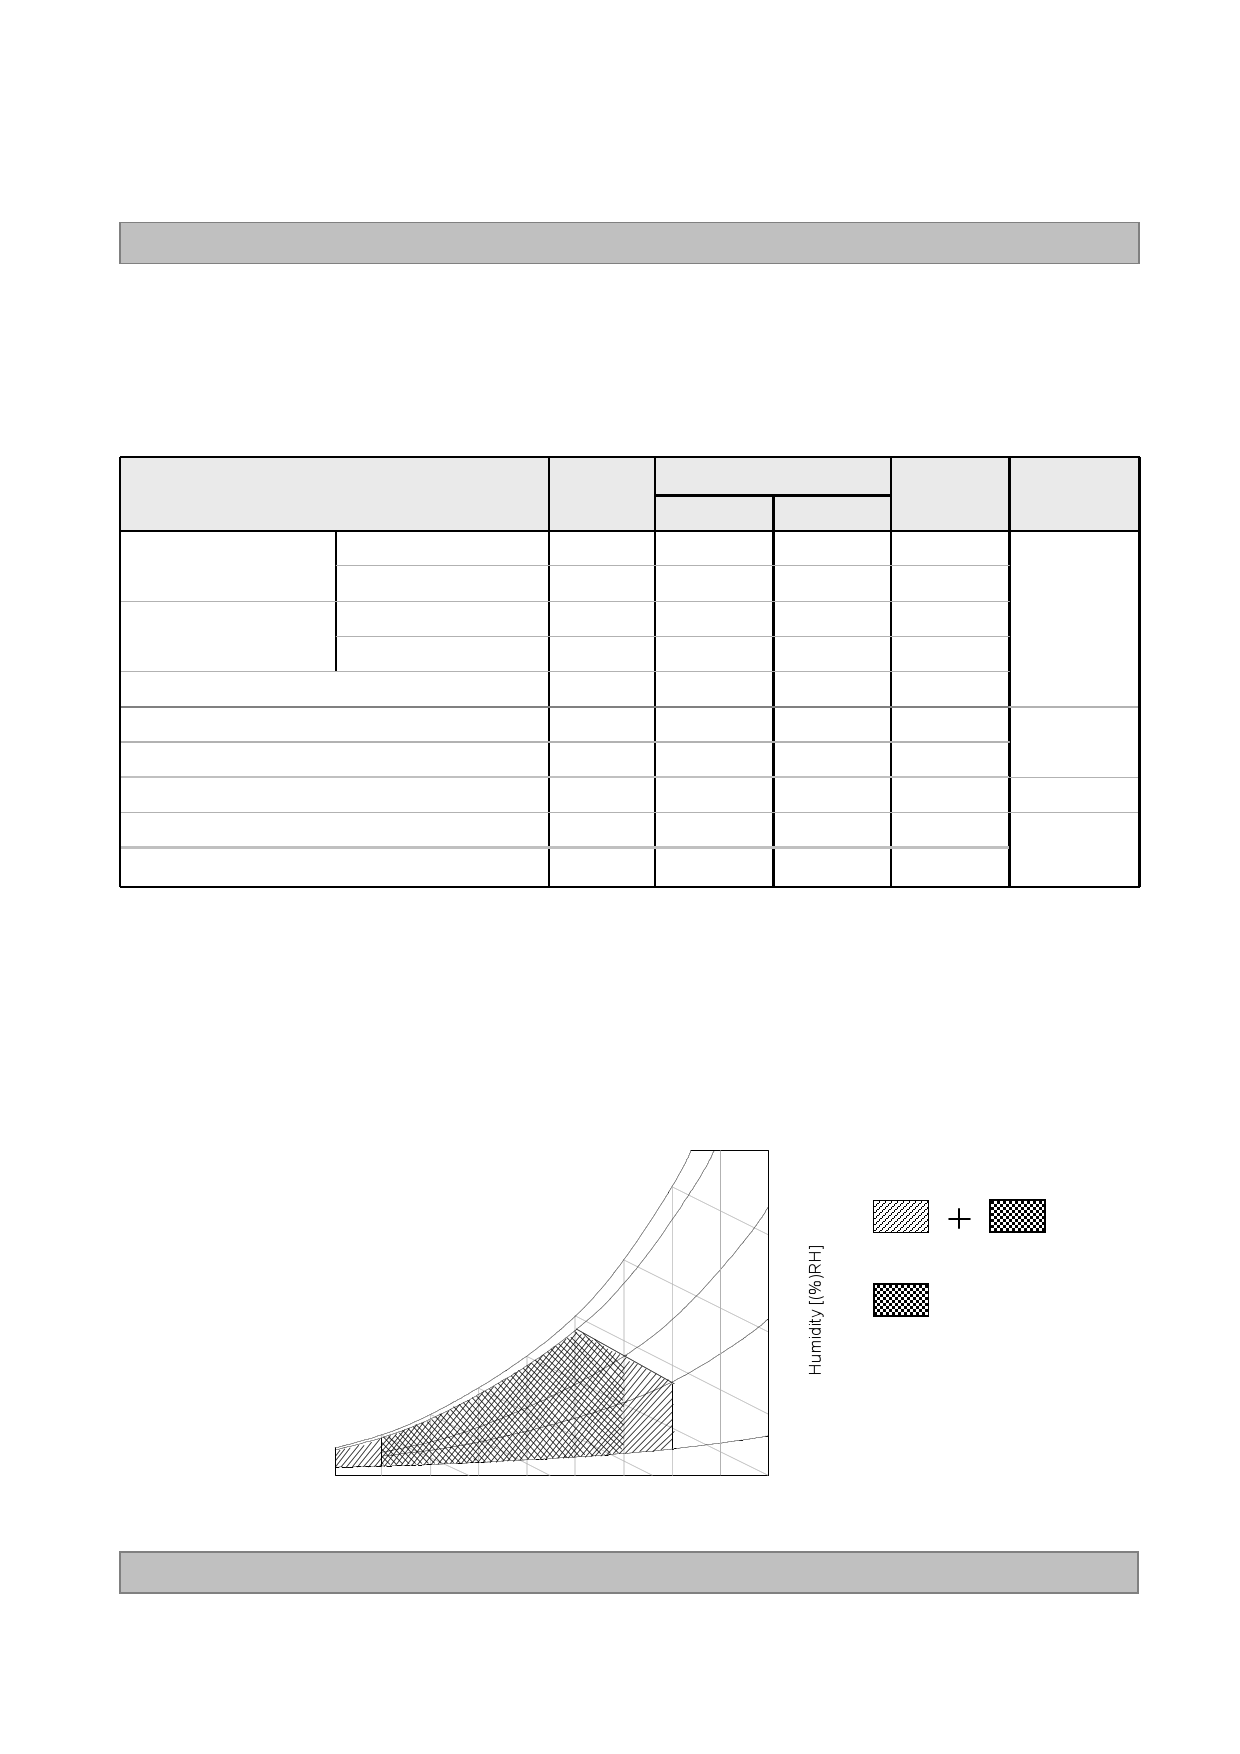 LC320EUN-SFM1 pdf